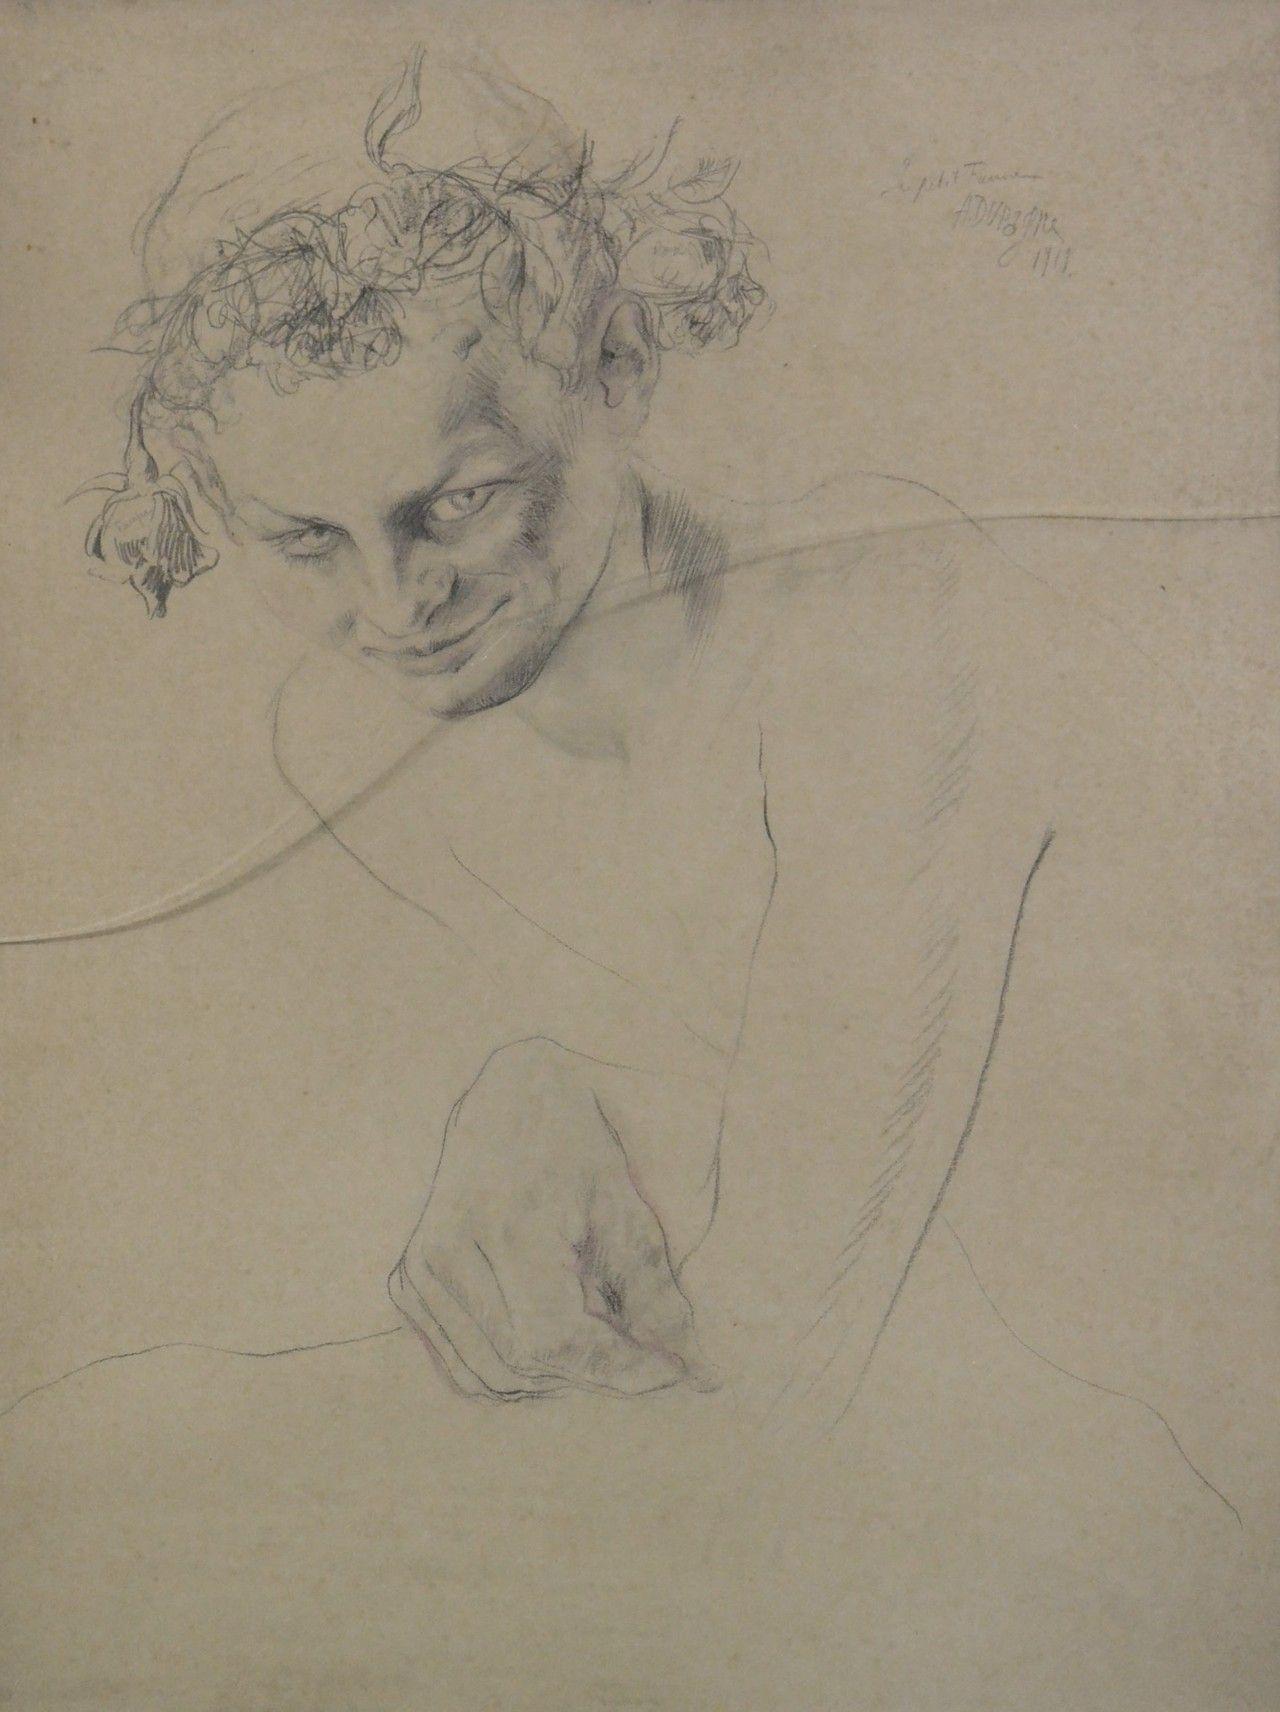 Arthur Dupagne (1895-1961) - Le petit faune, 1919